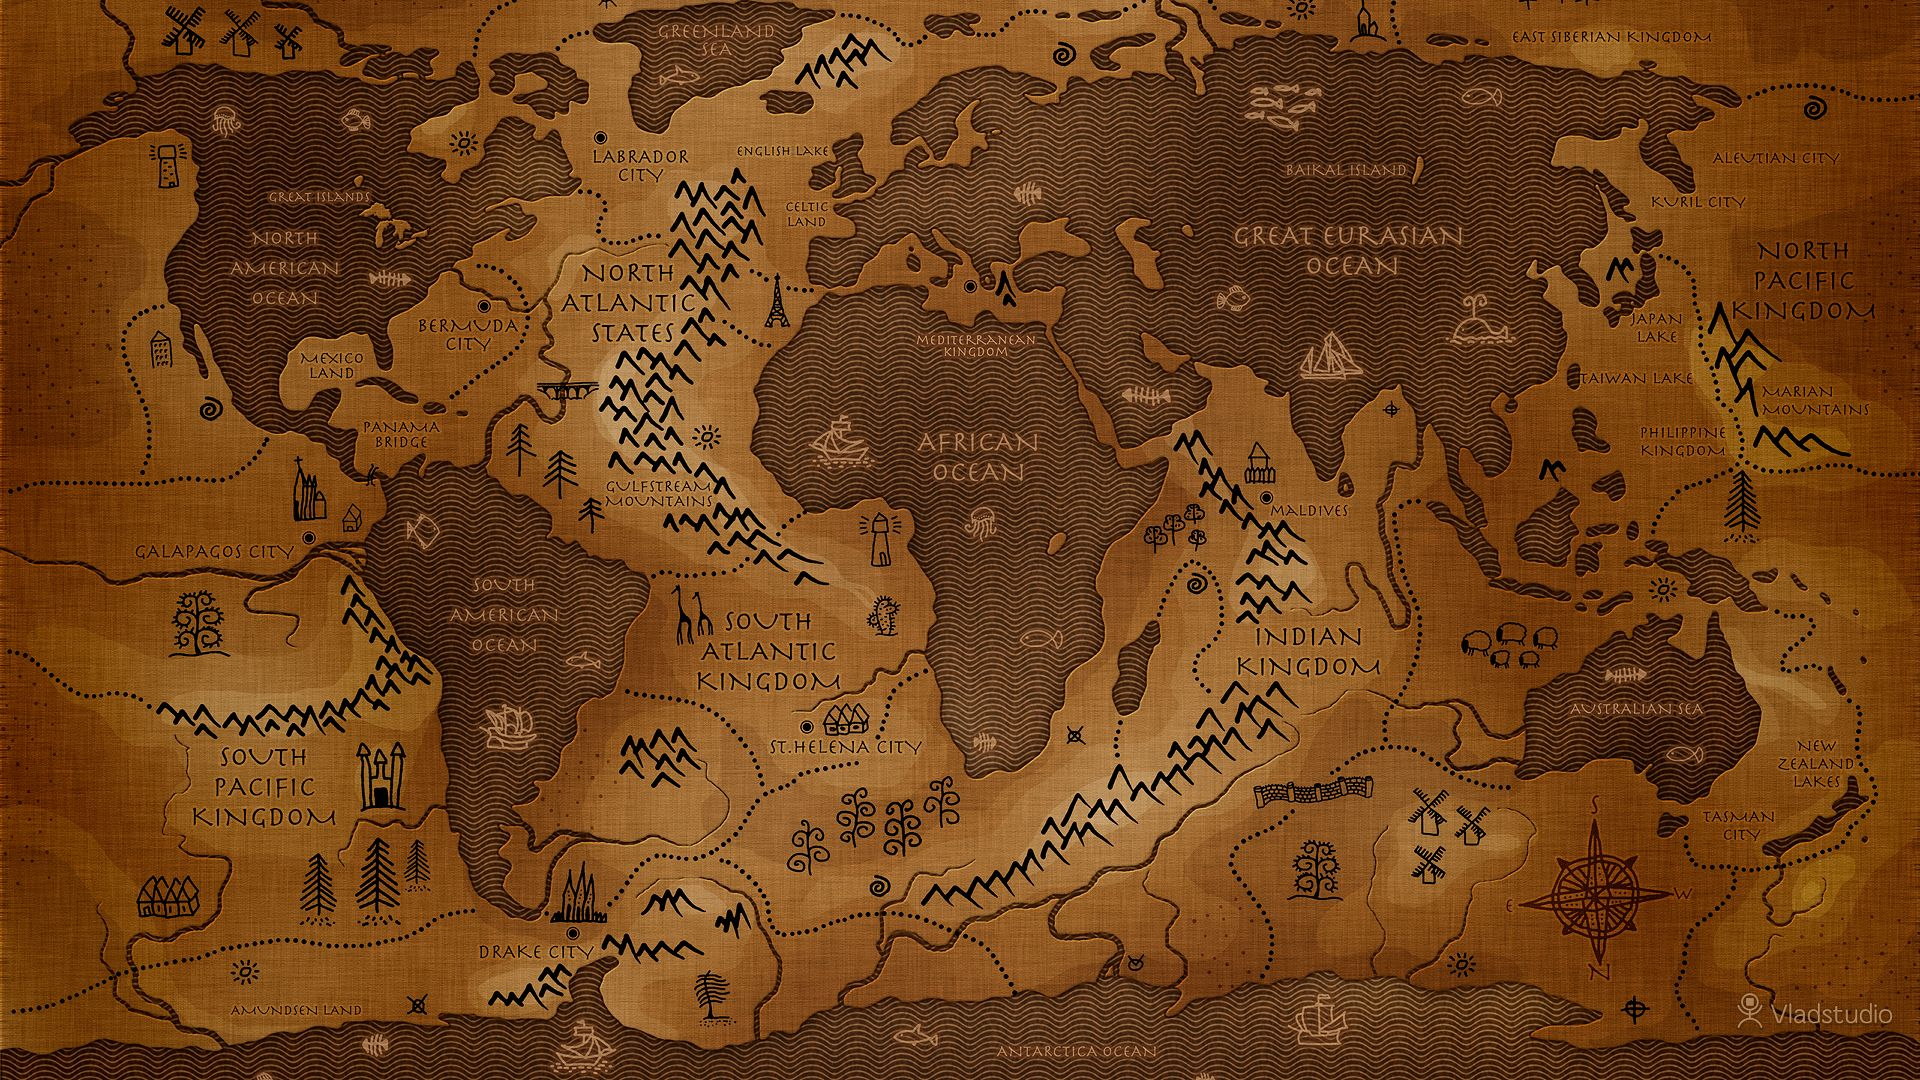 General inverted map world map Vladstudio history